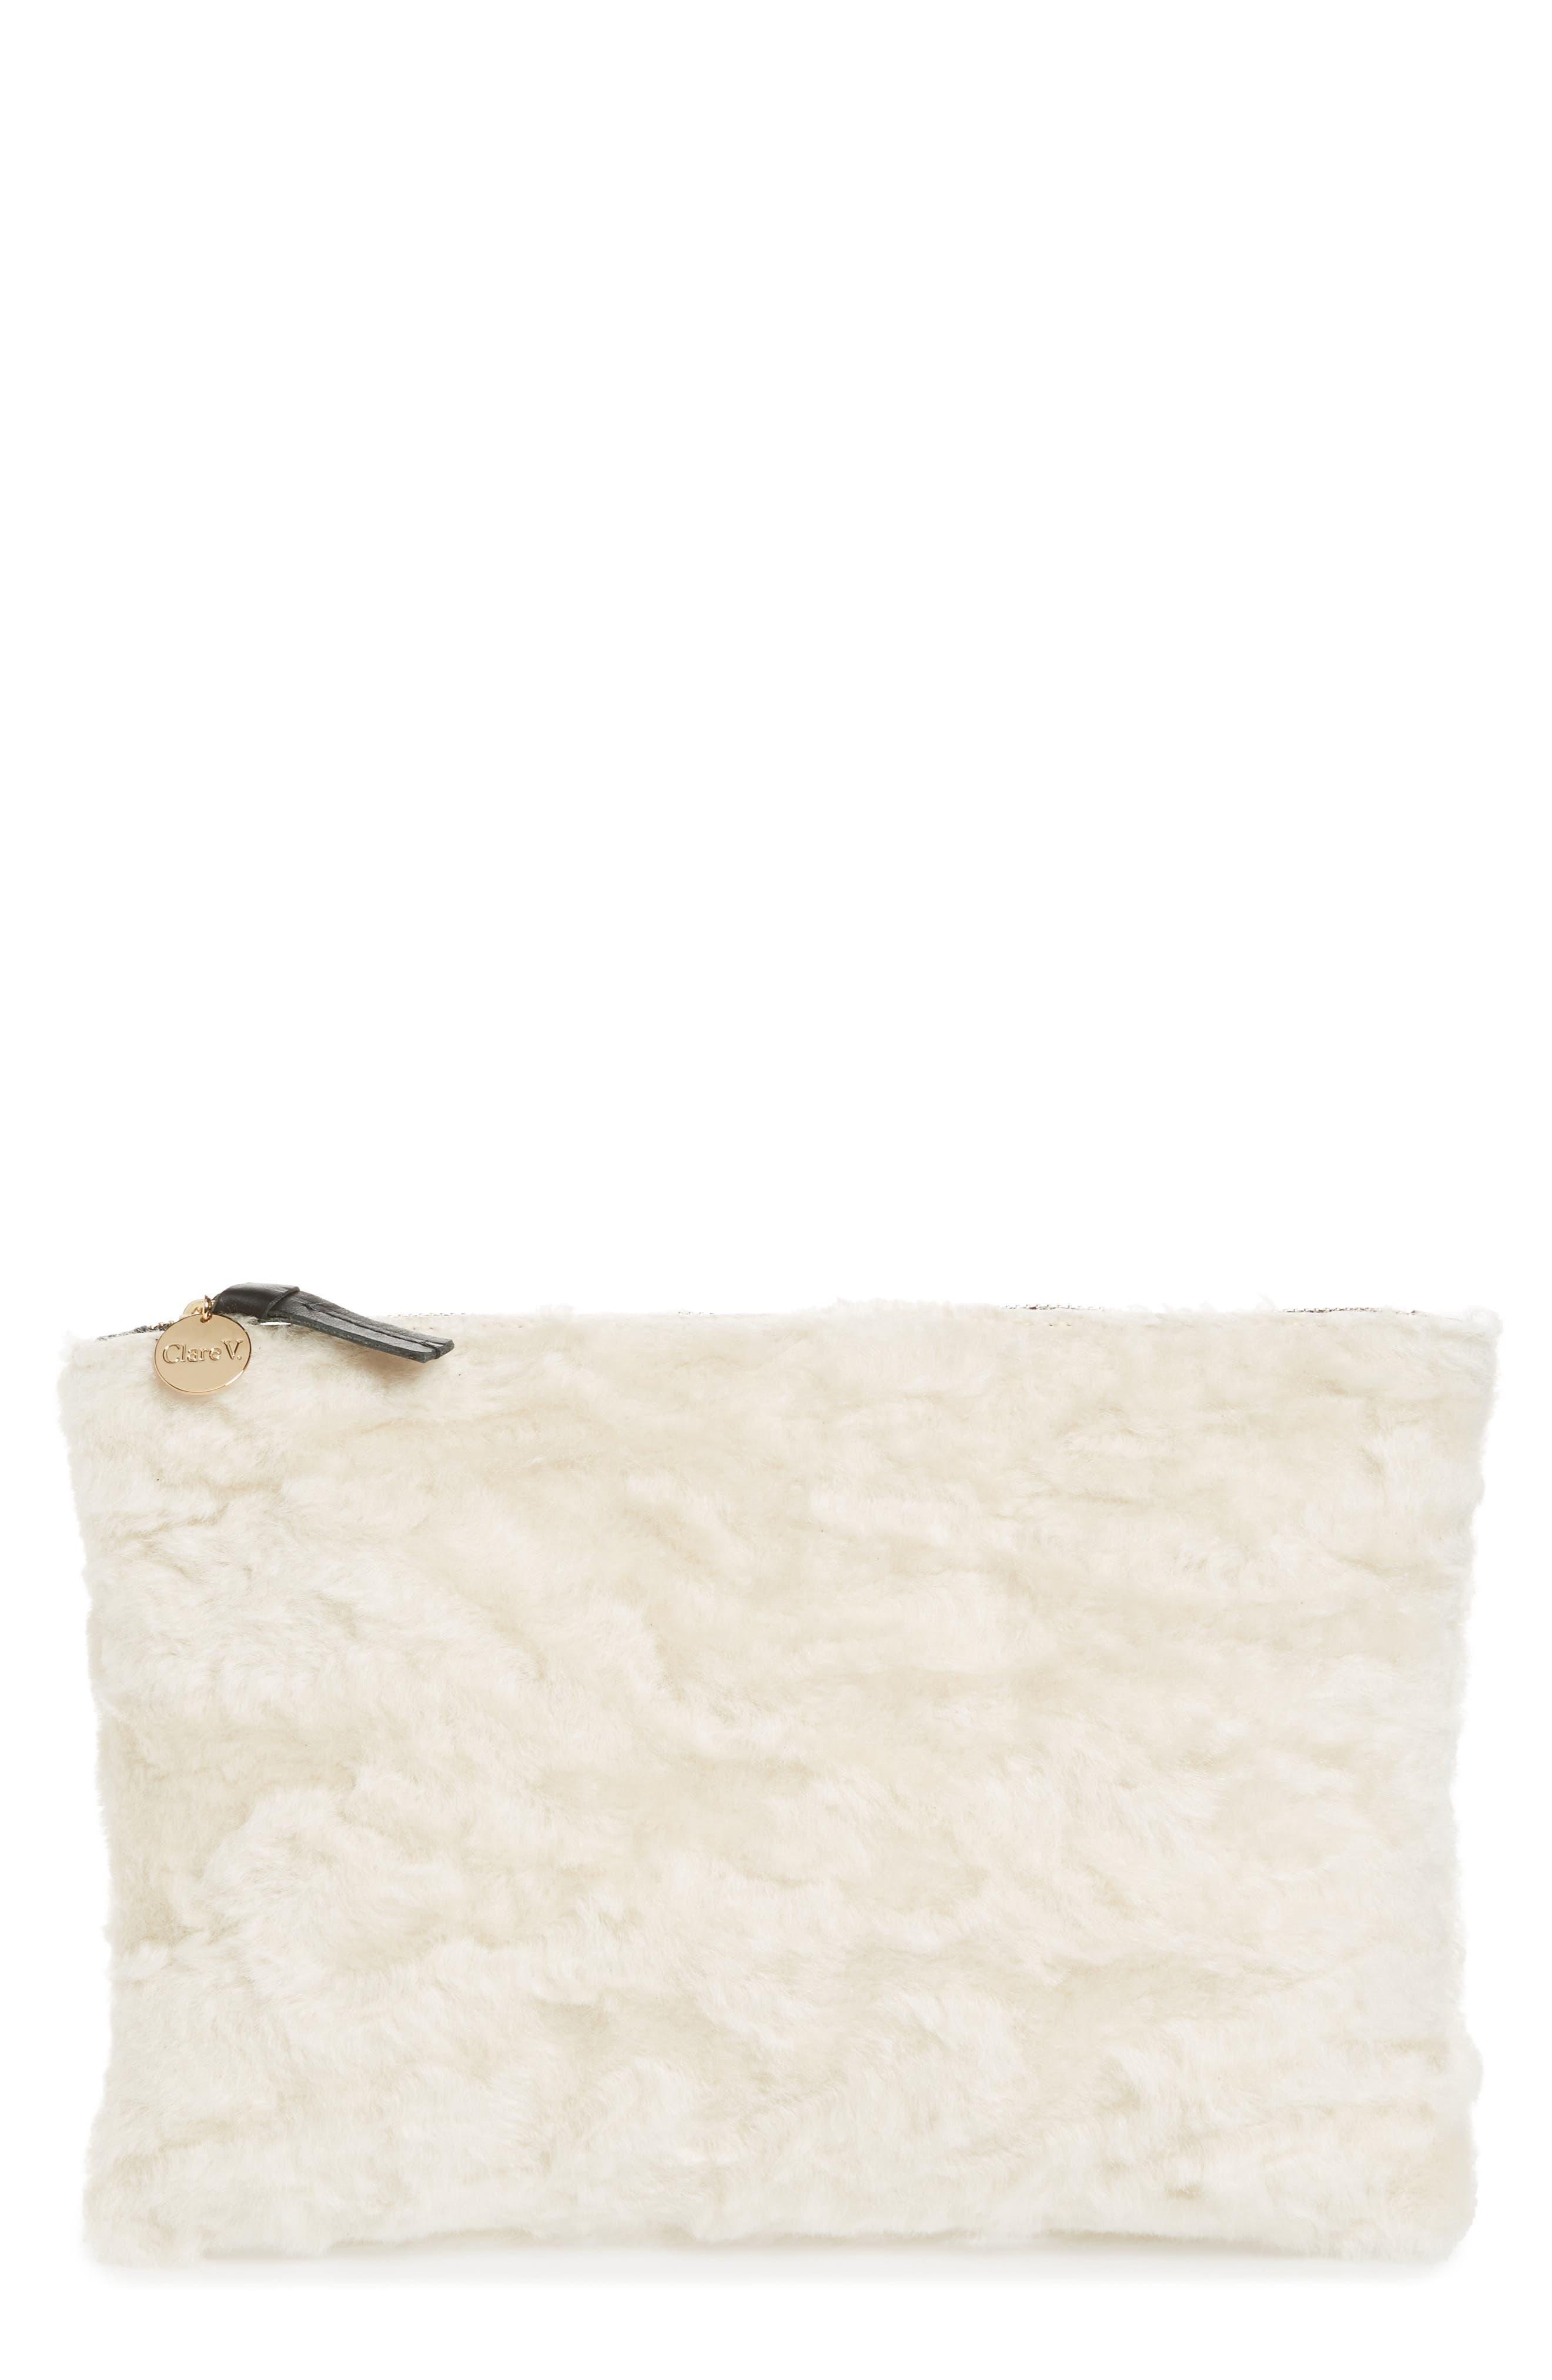 Main Image - Clare V. Genuine Shearling Flat Clutch